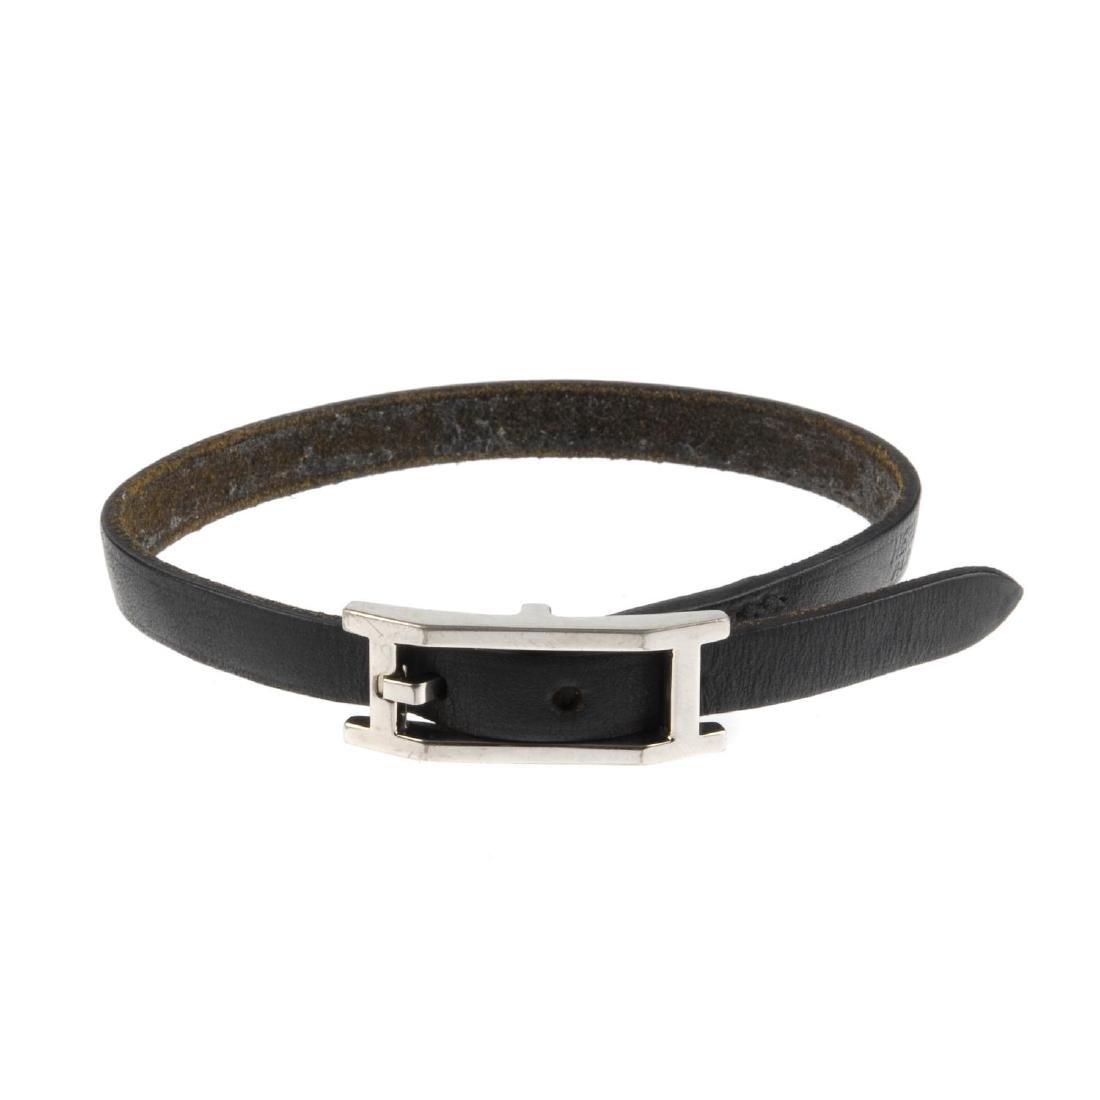 HERMÈS - a black leather bracelet. The silver-tone